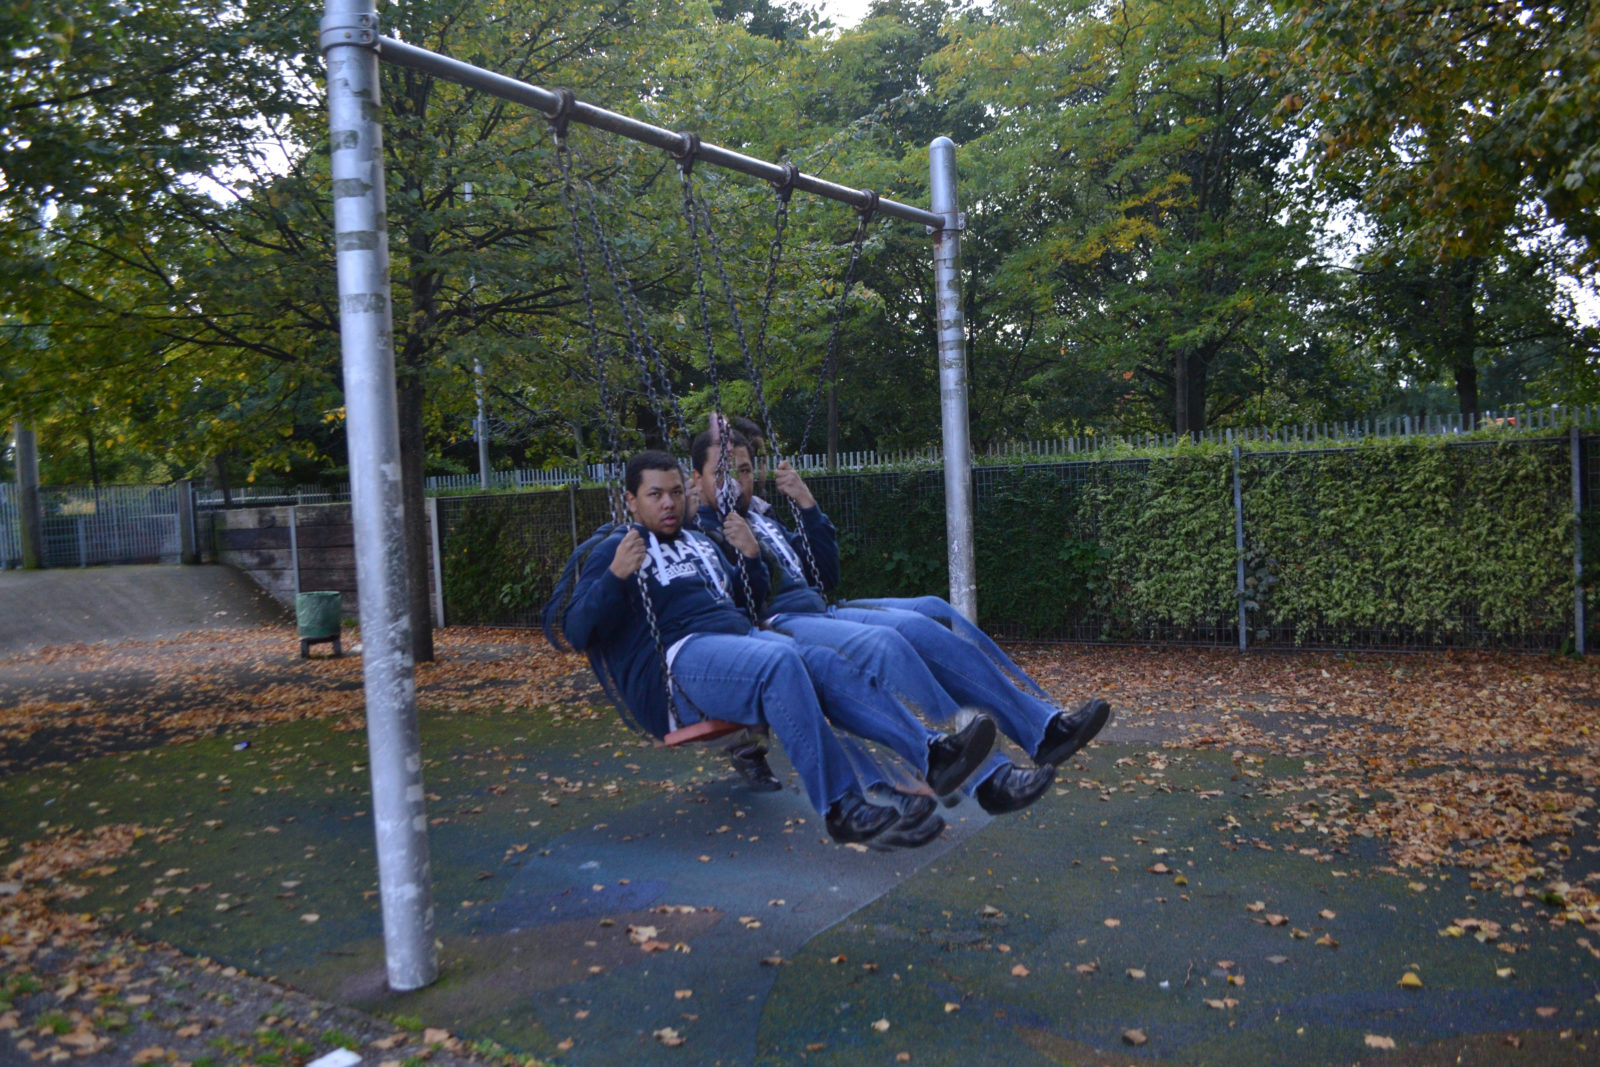 35616 || 5466 || Swings